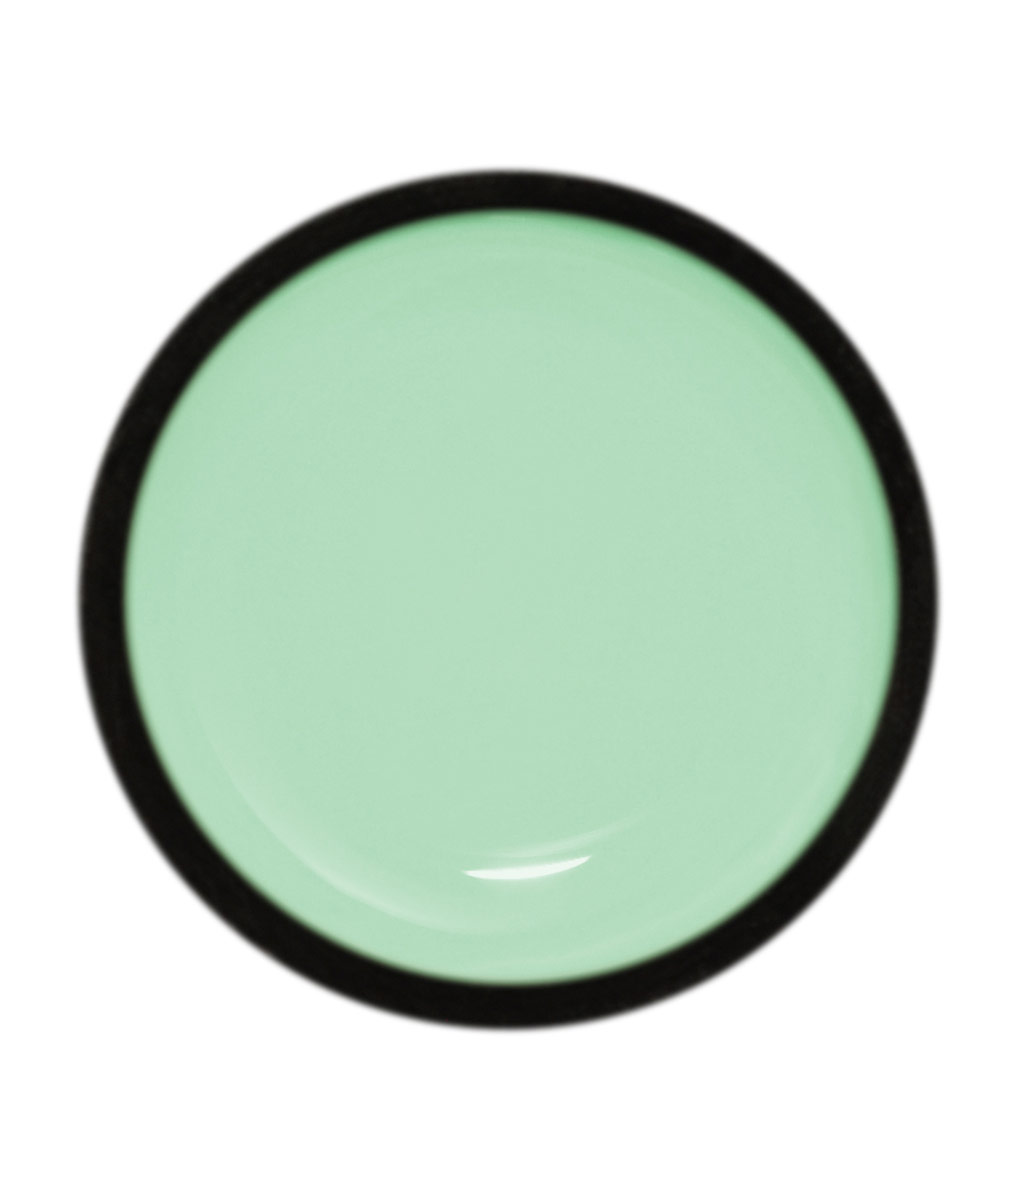 NV939-Mint Tea Lack